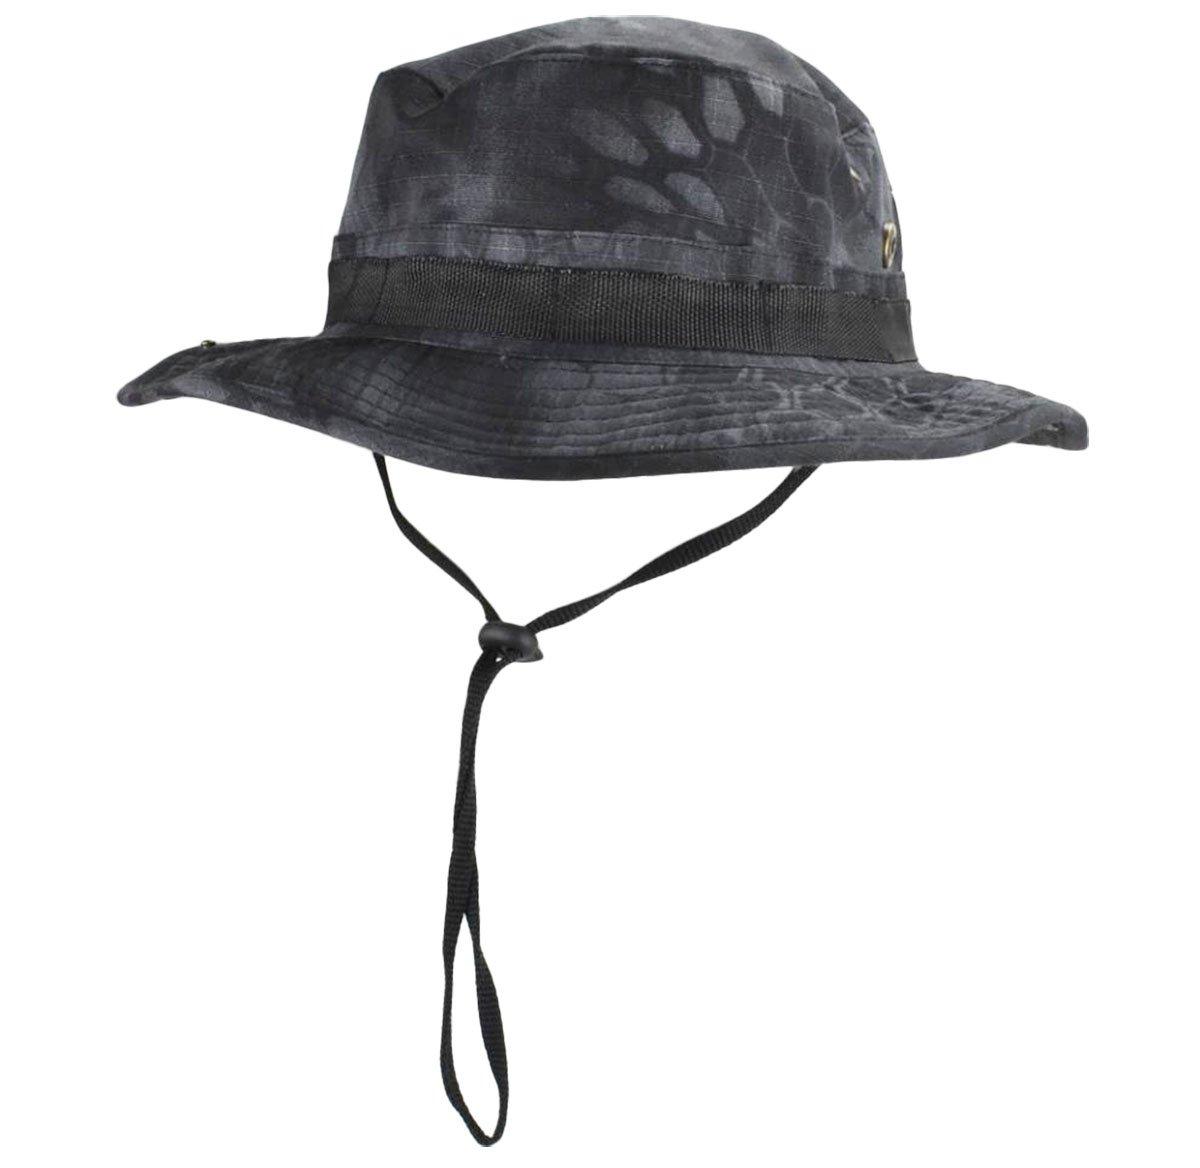 7d19e842cb16b jffcestore Men s Military Camo Boonie Hat Fishing Sun Hat Snap Wide Brim  Bucket Hat with Adjustable Strap(Black ty)